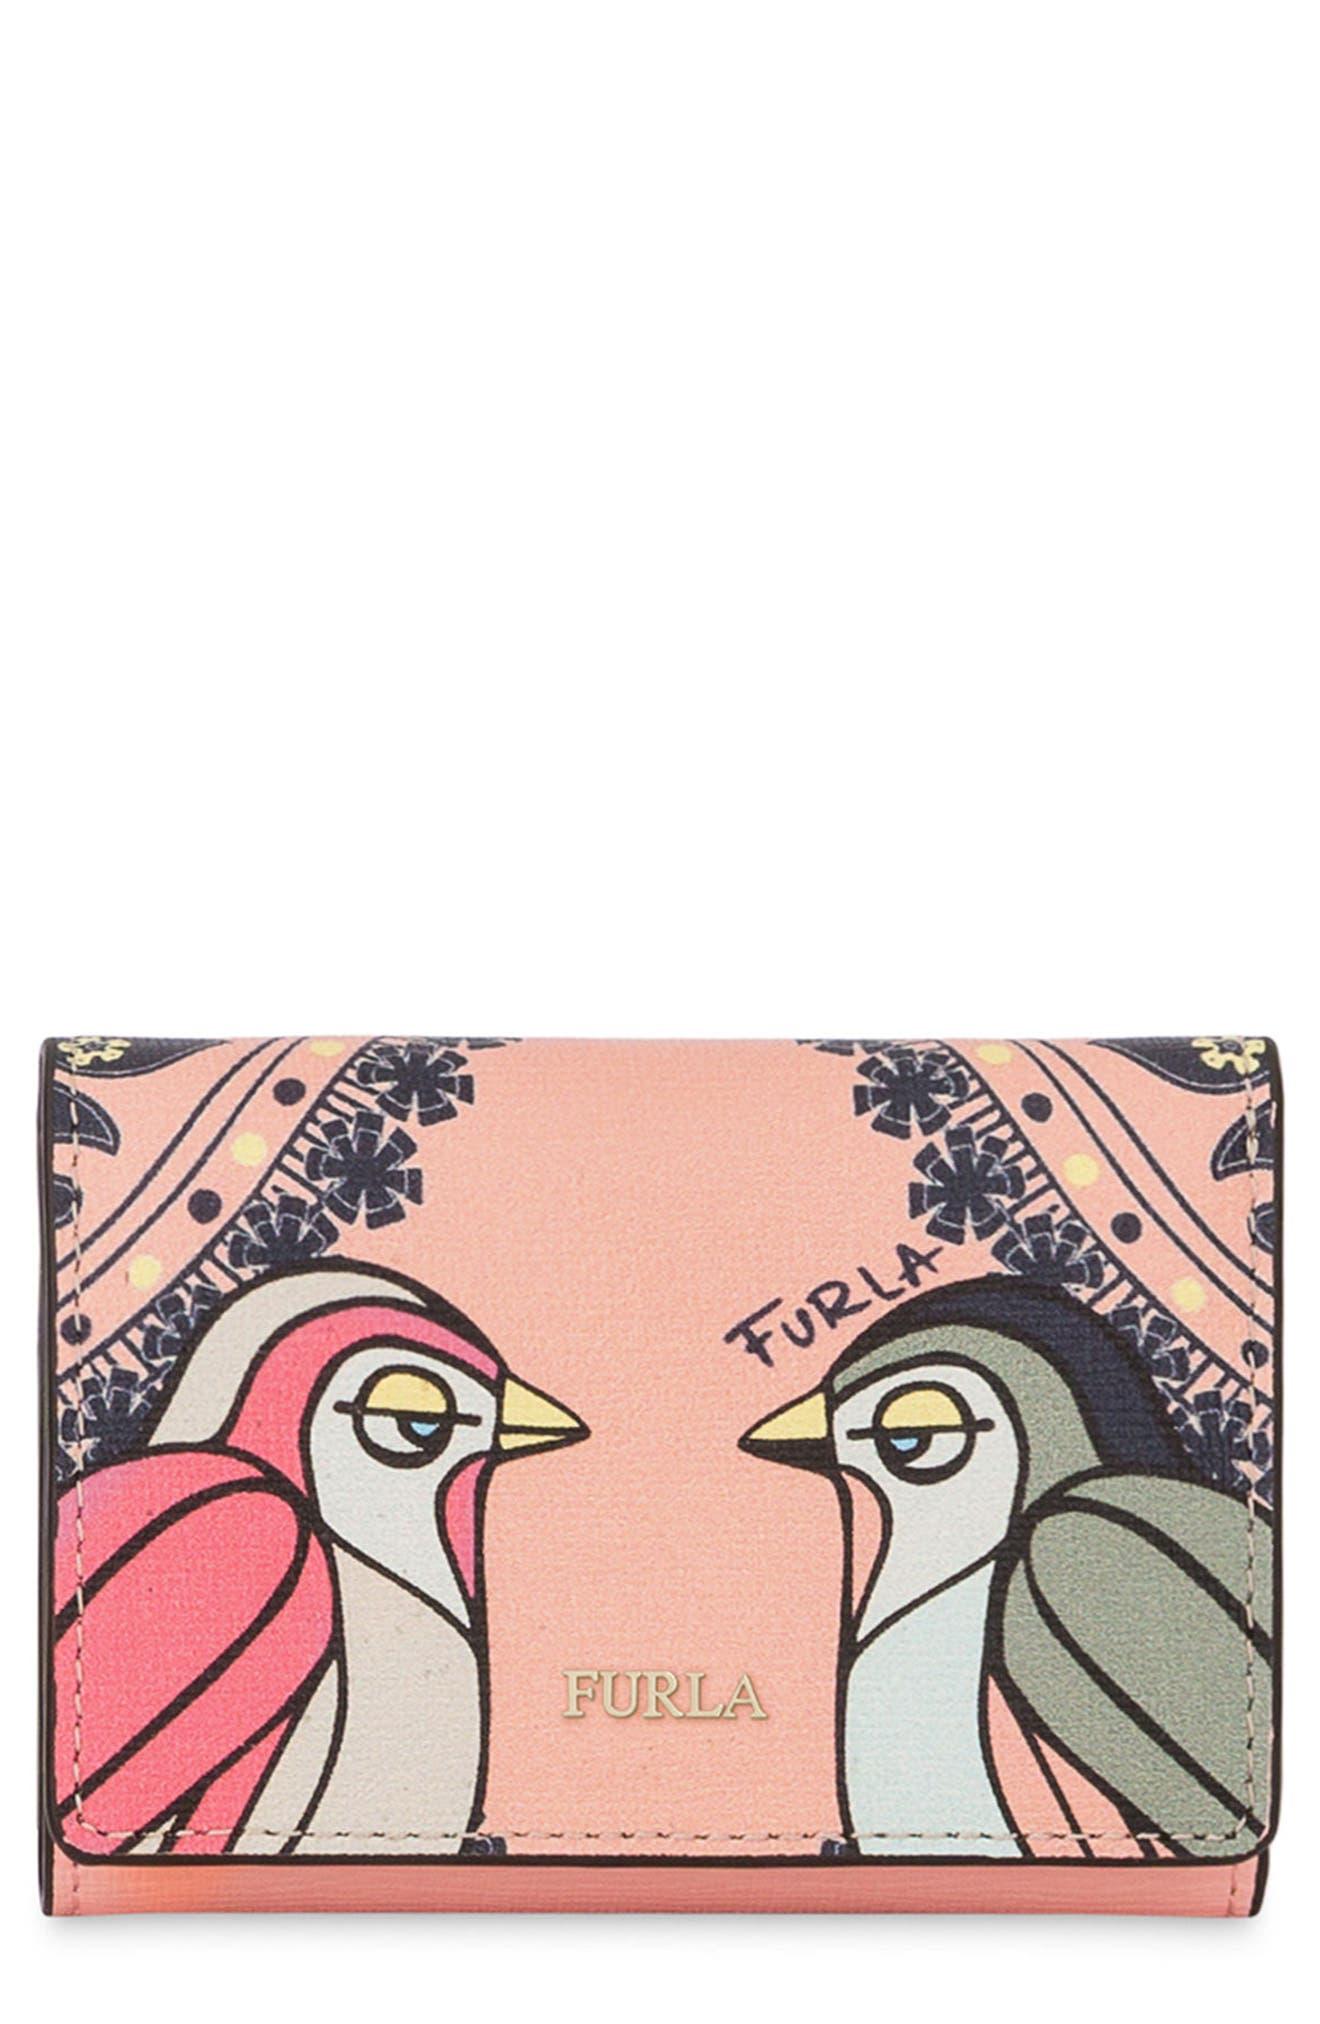 Main Image - Furla Babylon Saffiano Leather Trifold Wallet